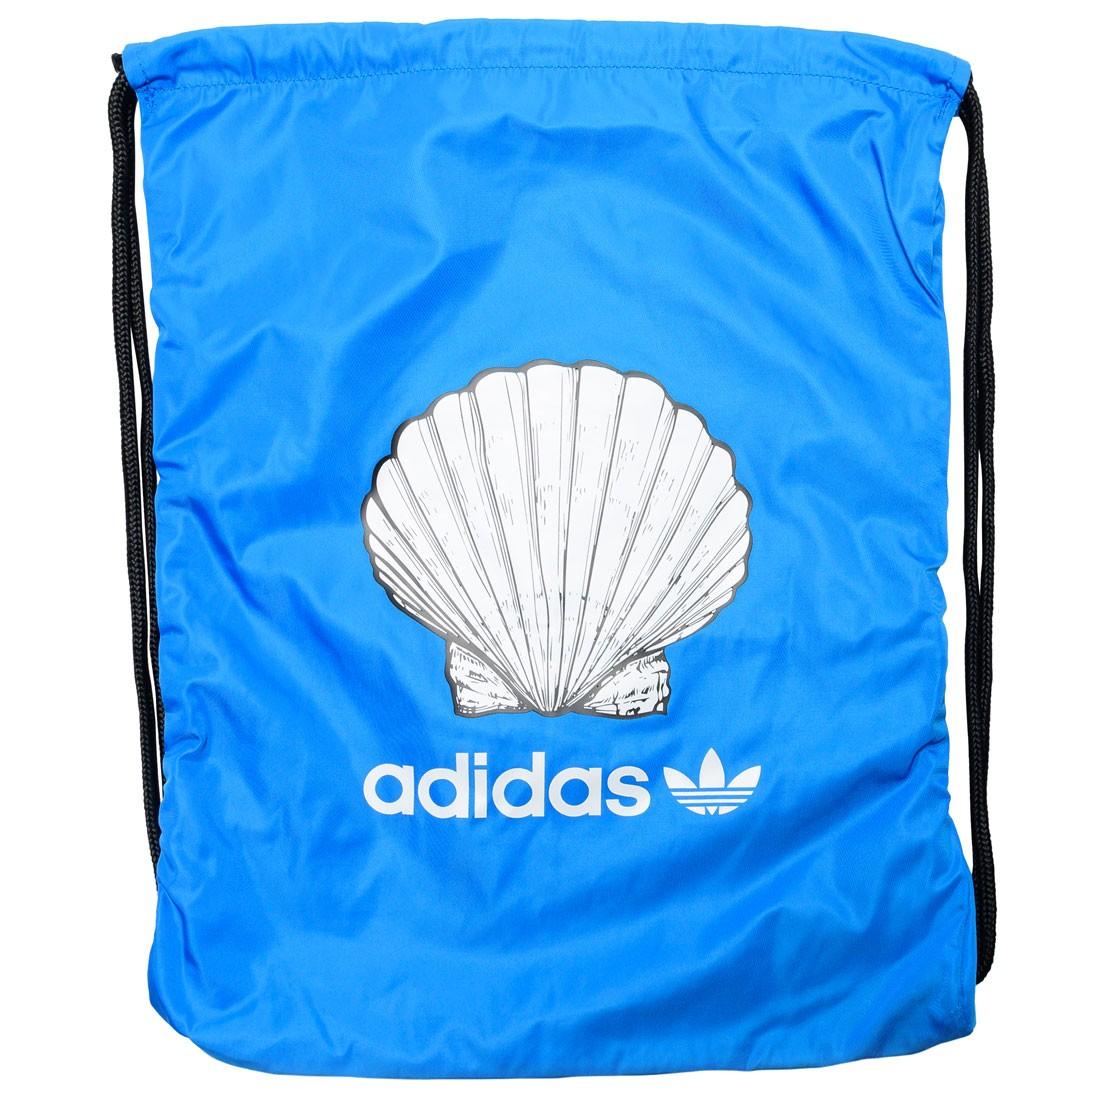 Adidas x Noah Bag (blue / blue bird)